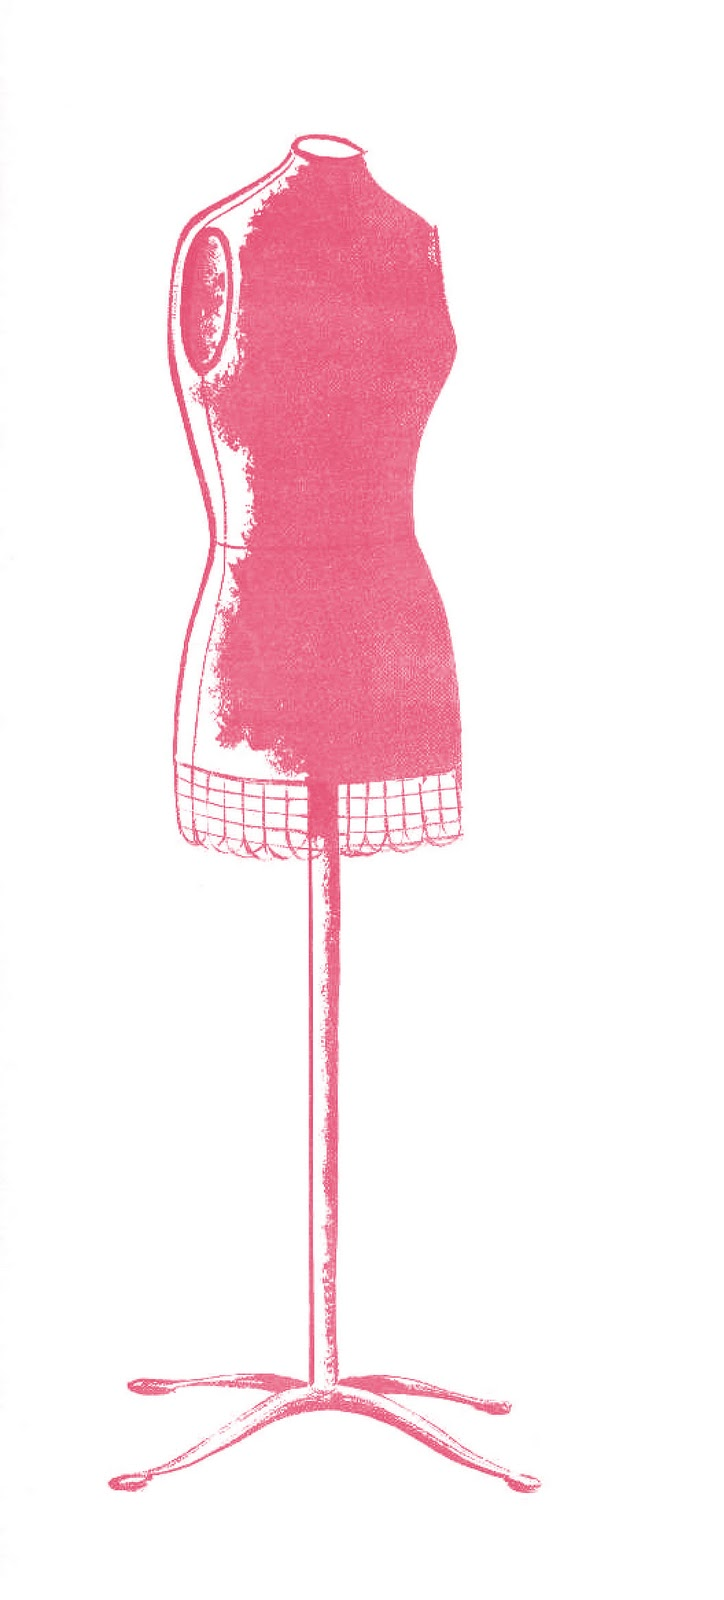 Dress form vector art images